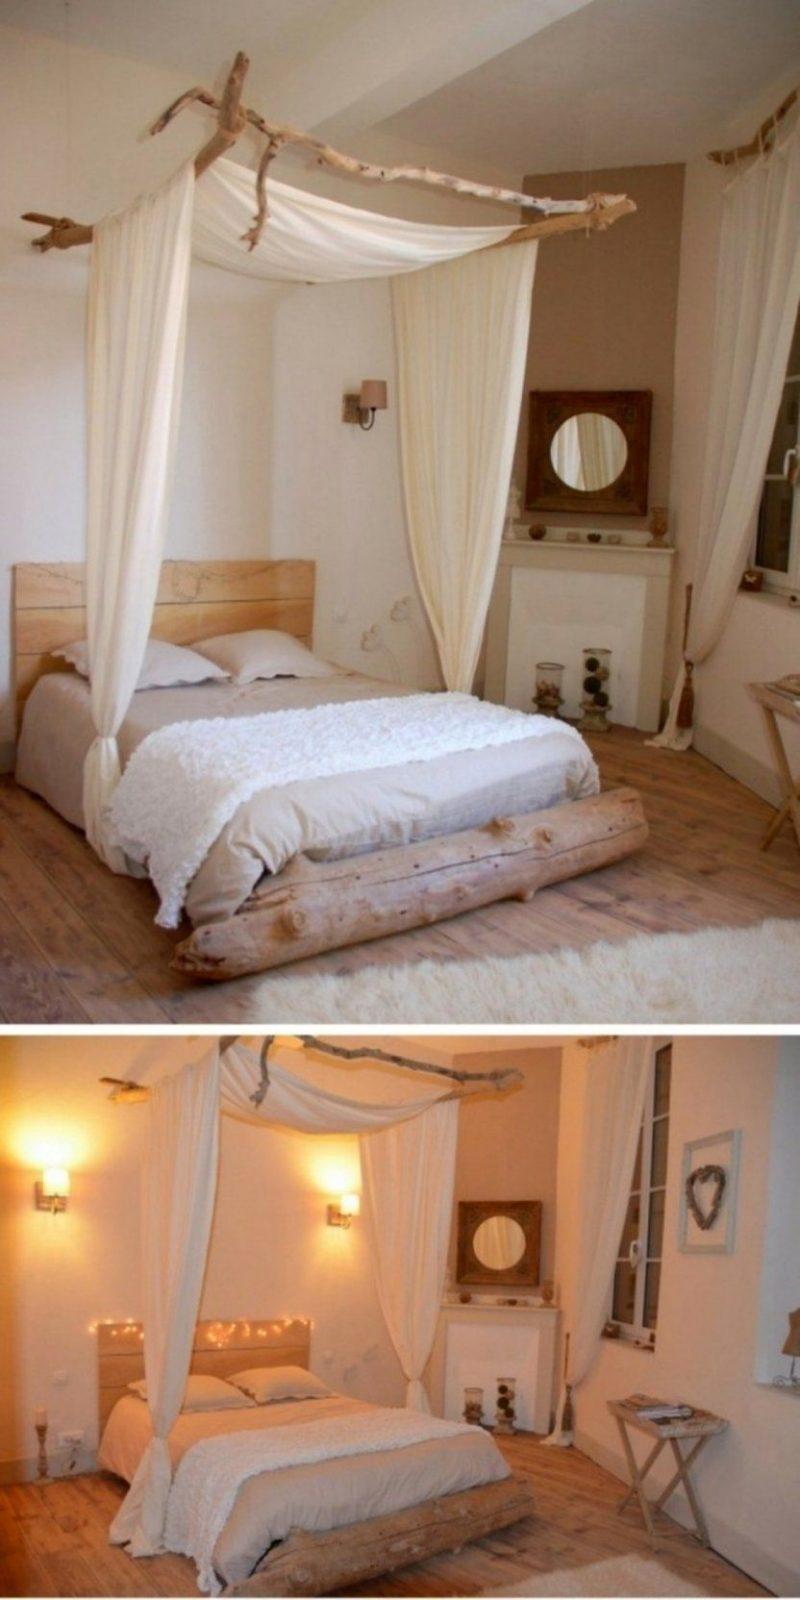 Interessant Himmel Bett – Illuminode Zum Himmelbett Bauen von Himmelbett Vorhang Selber Machen Bild